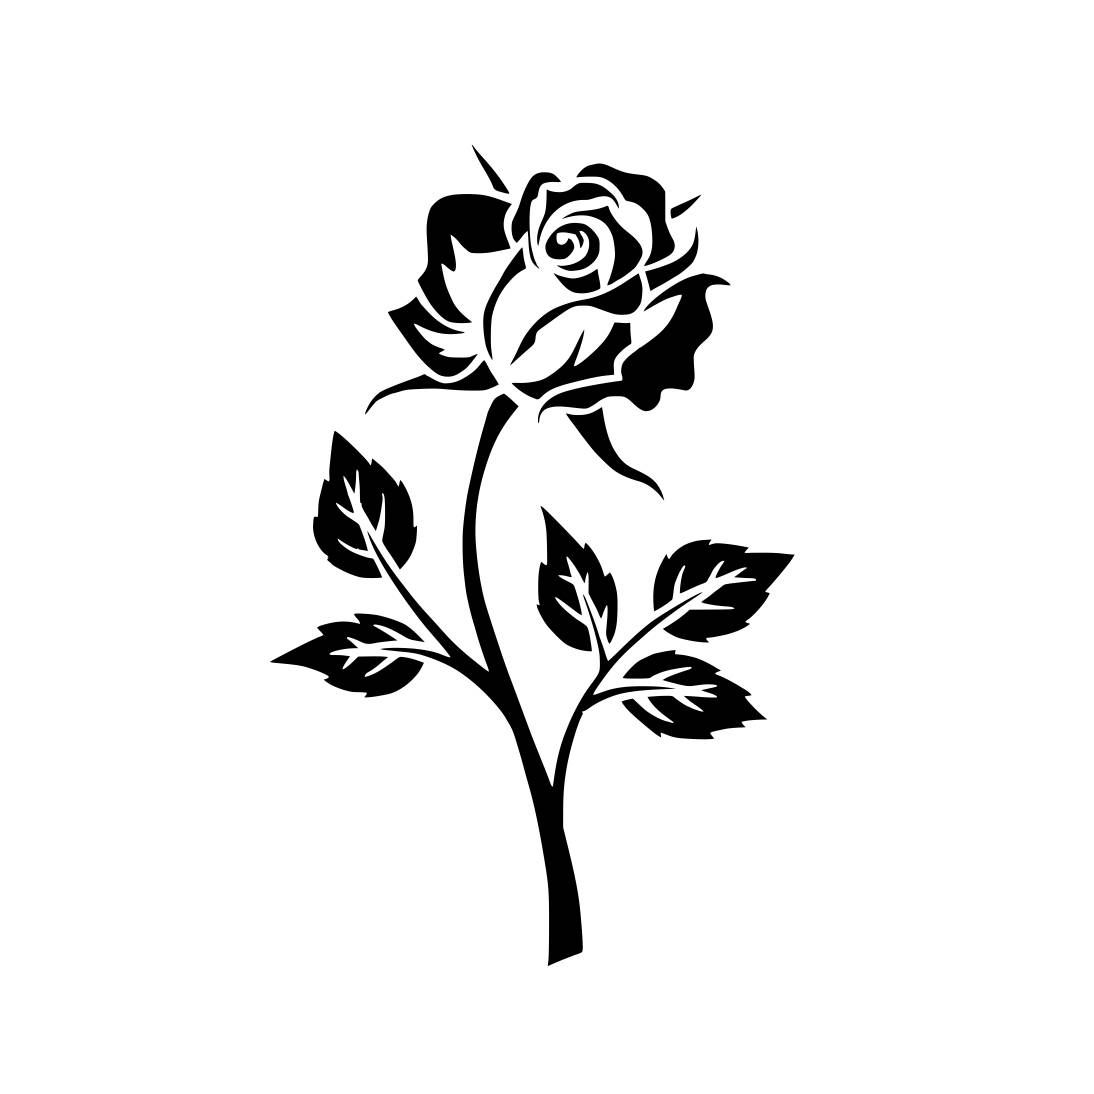 Floral Flower Plant Rose Graphics Svg Dxf Eps Cdr Ai